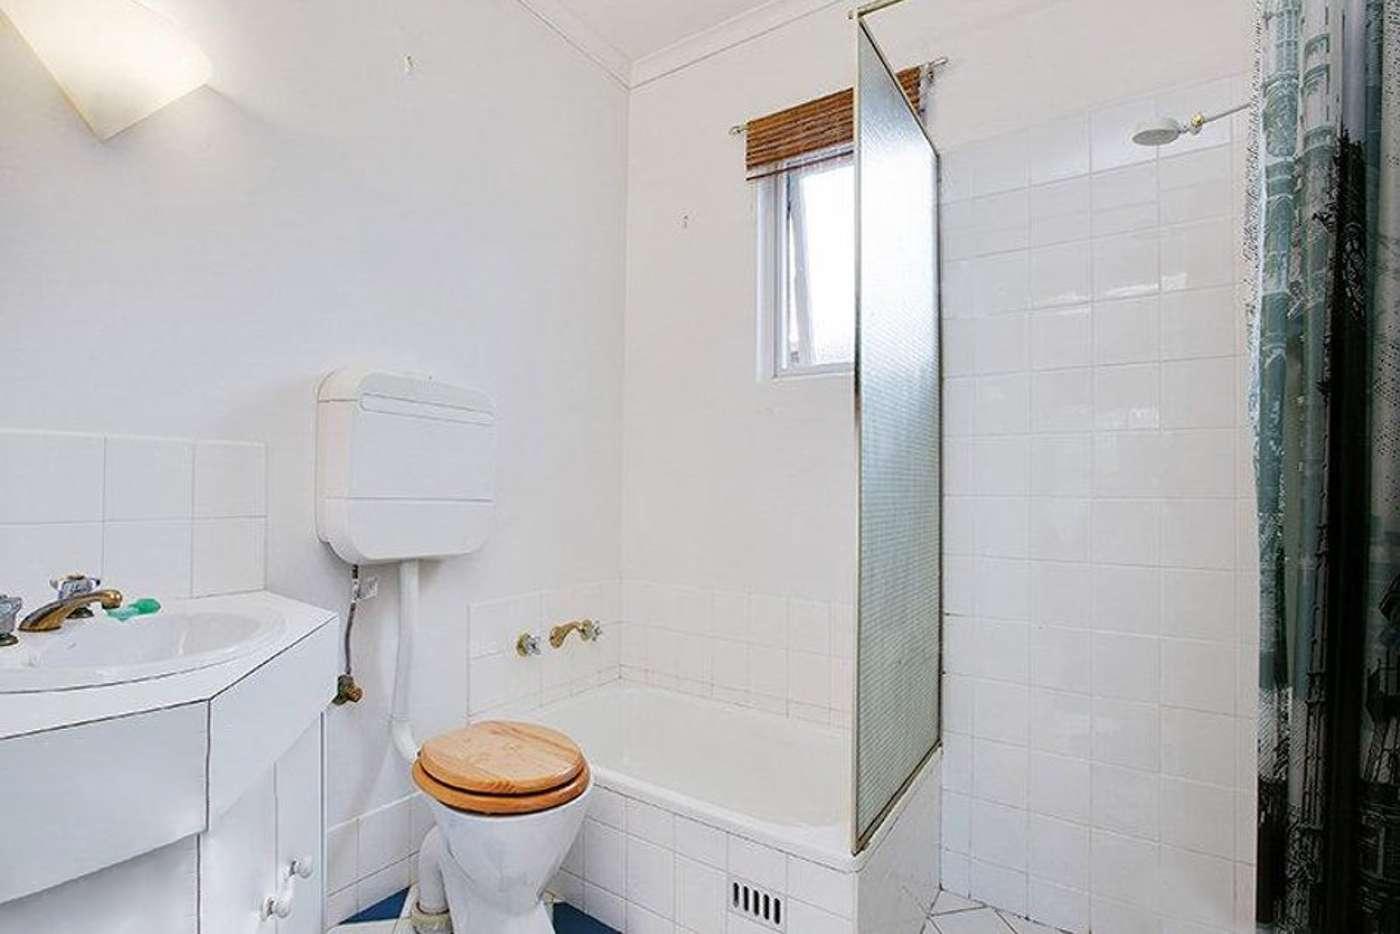 Seventh view of Homely unit listing, 13/16 L'Estrange Street, Glenside SA 5065